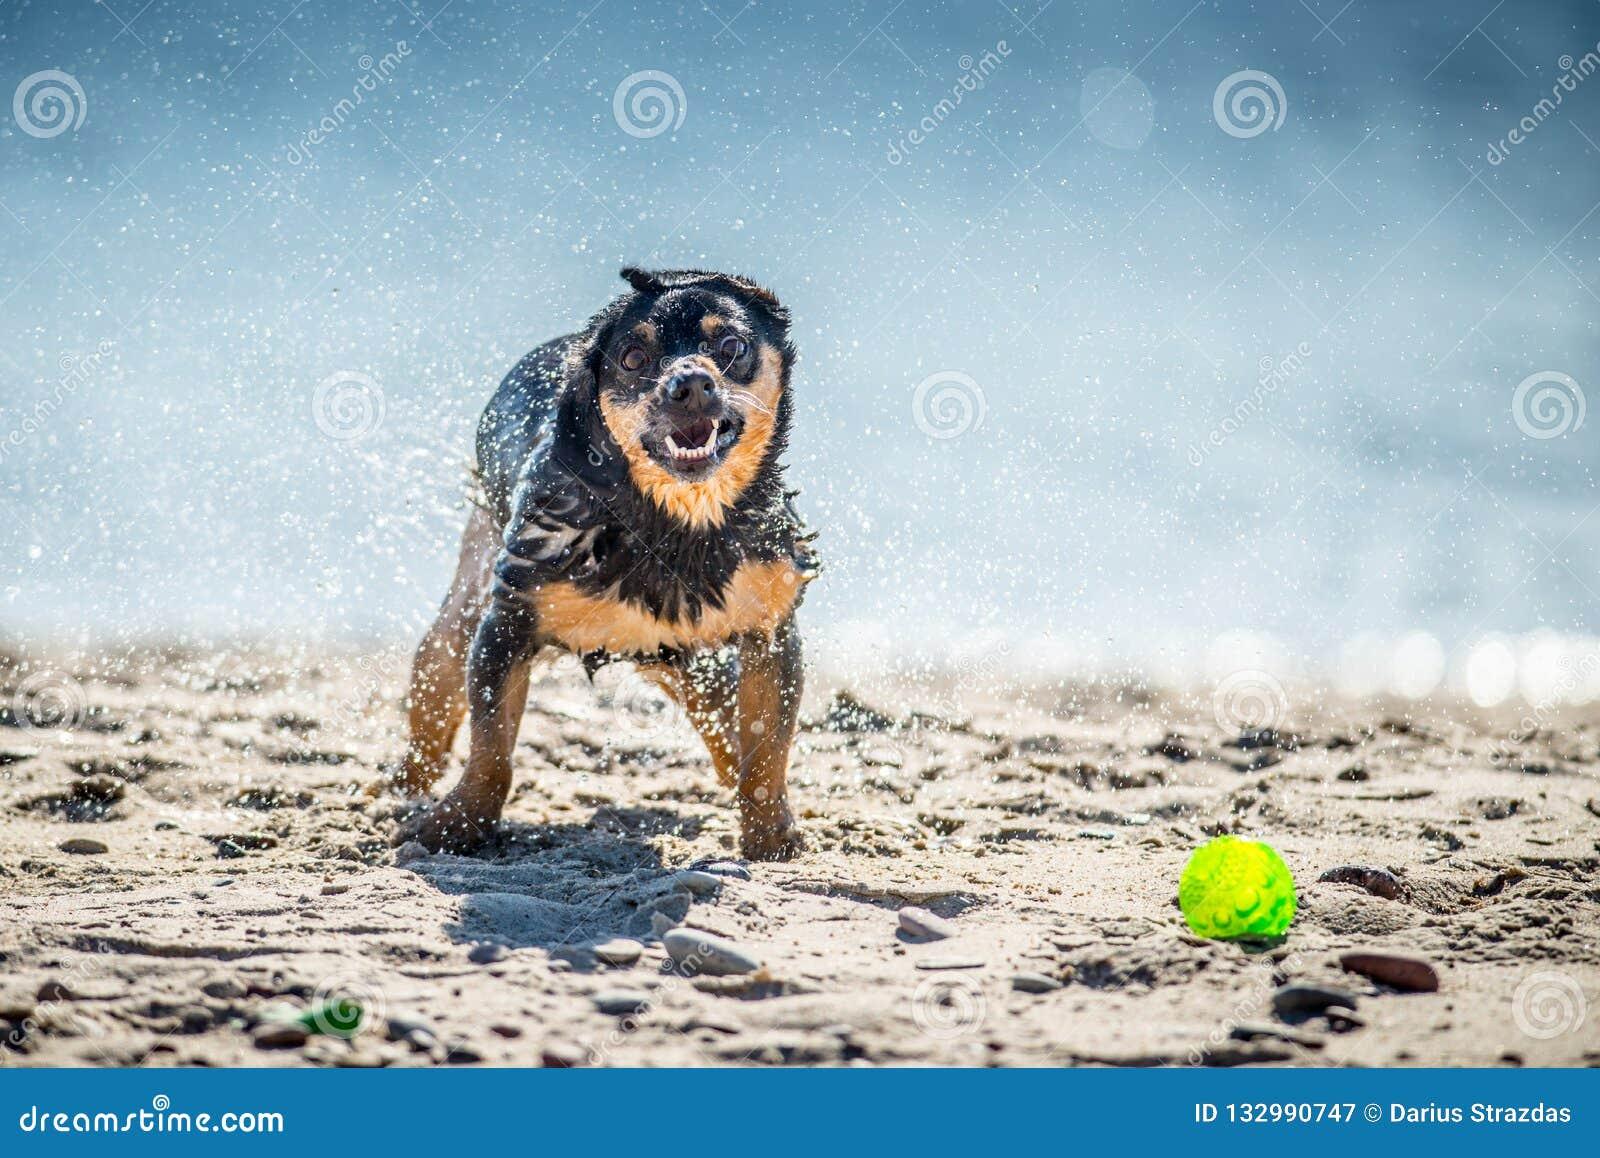 Funny dog games near water, splashing droplets